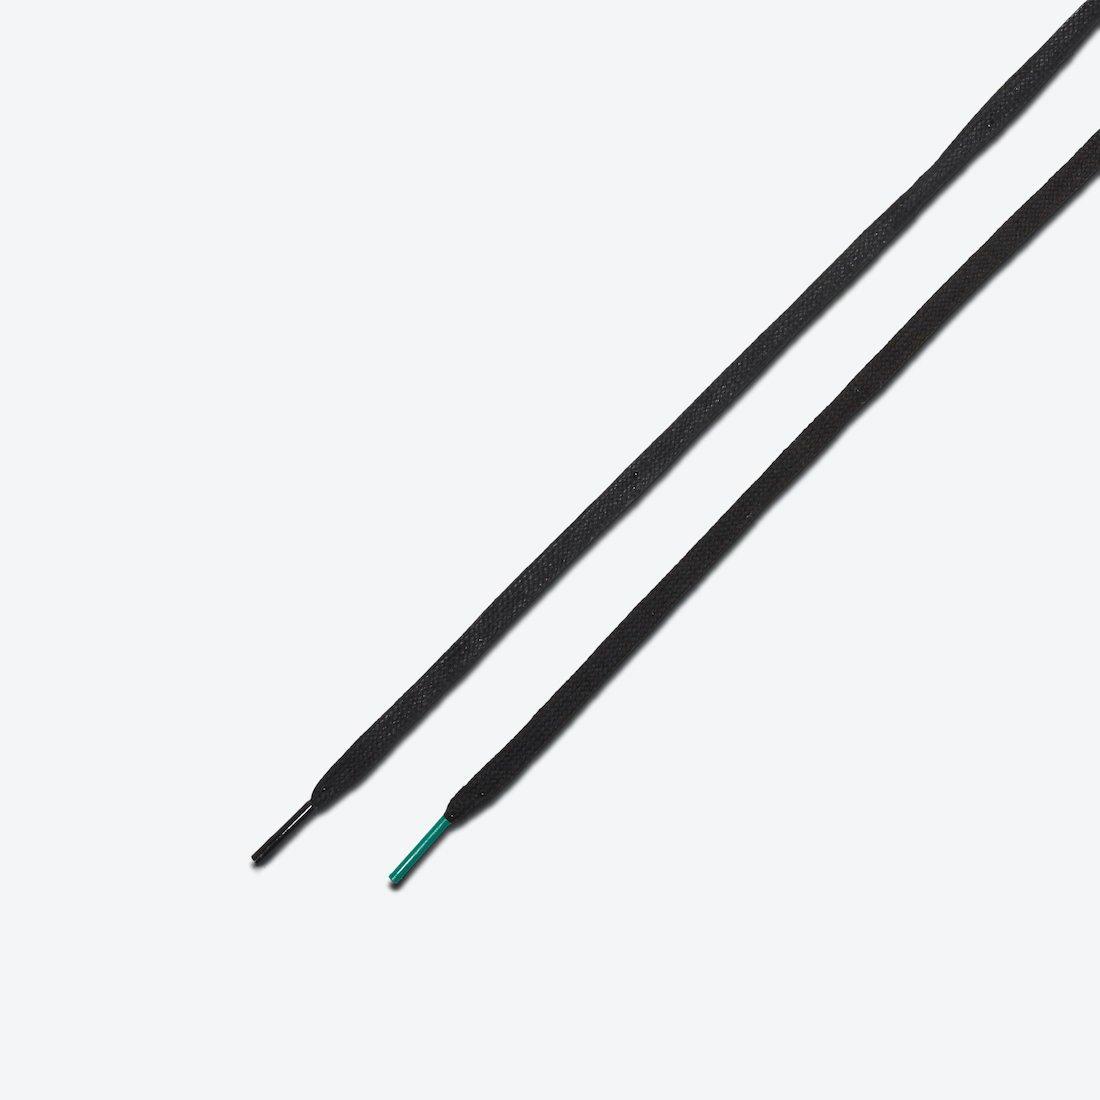 bdega-nike-dunk-high-cz8125-200-100-release-2020-winter